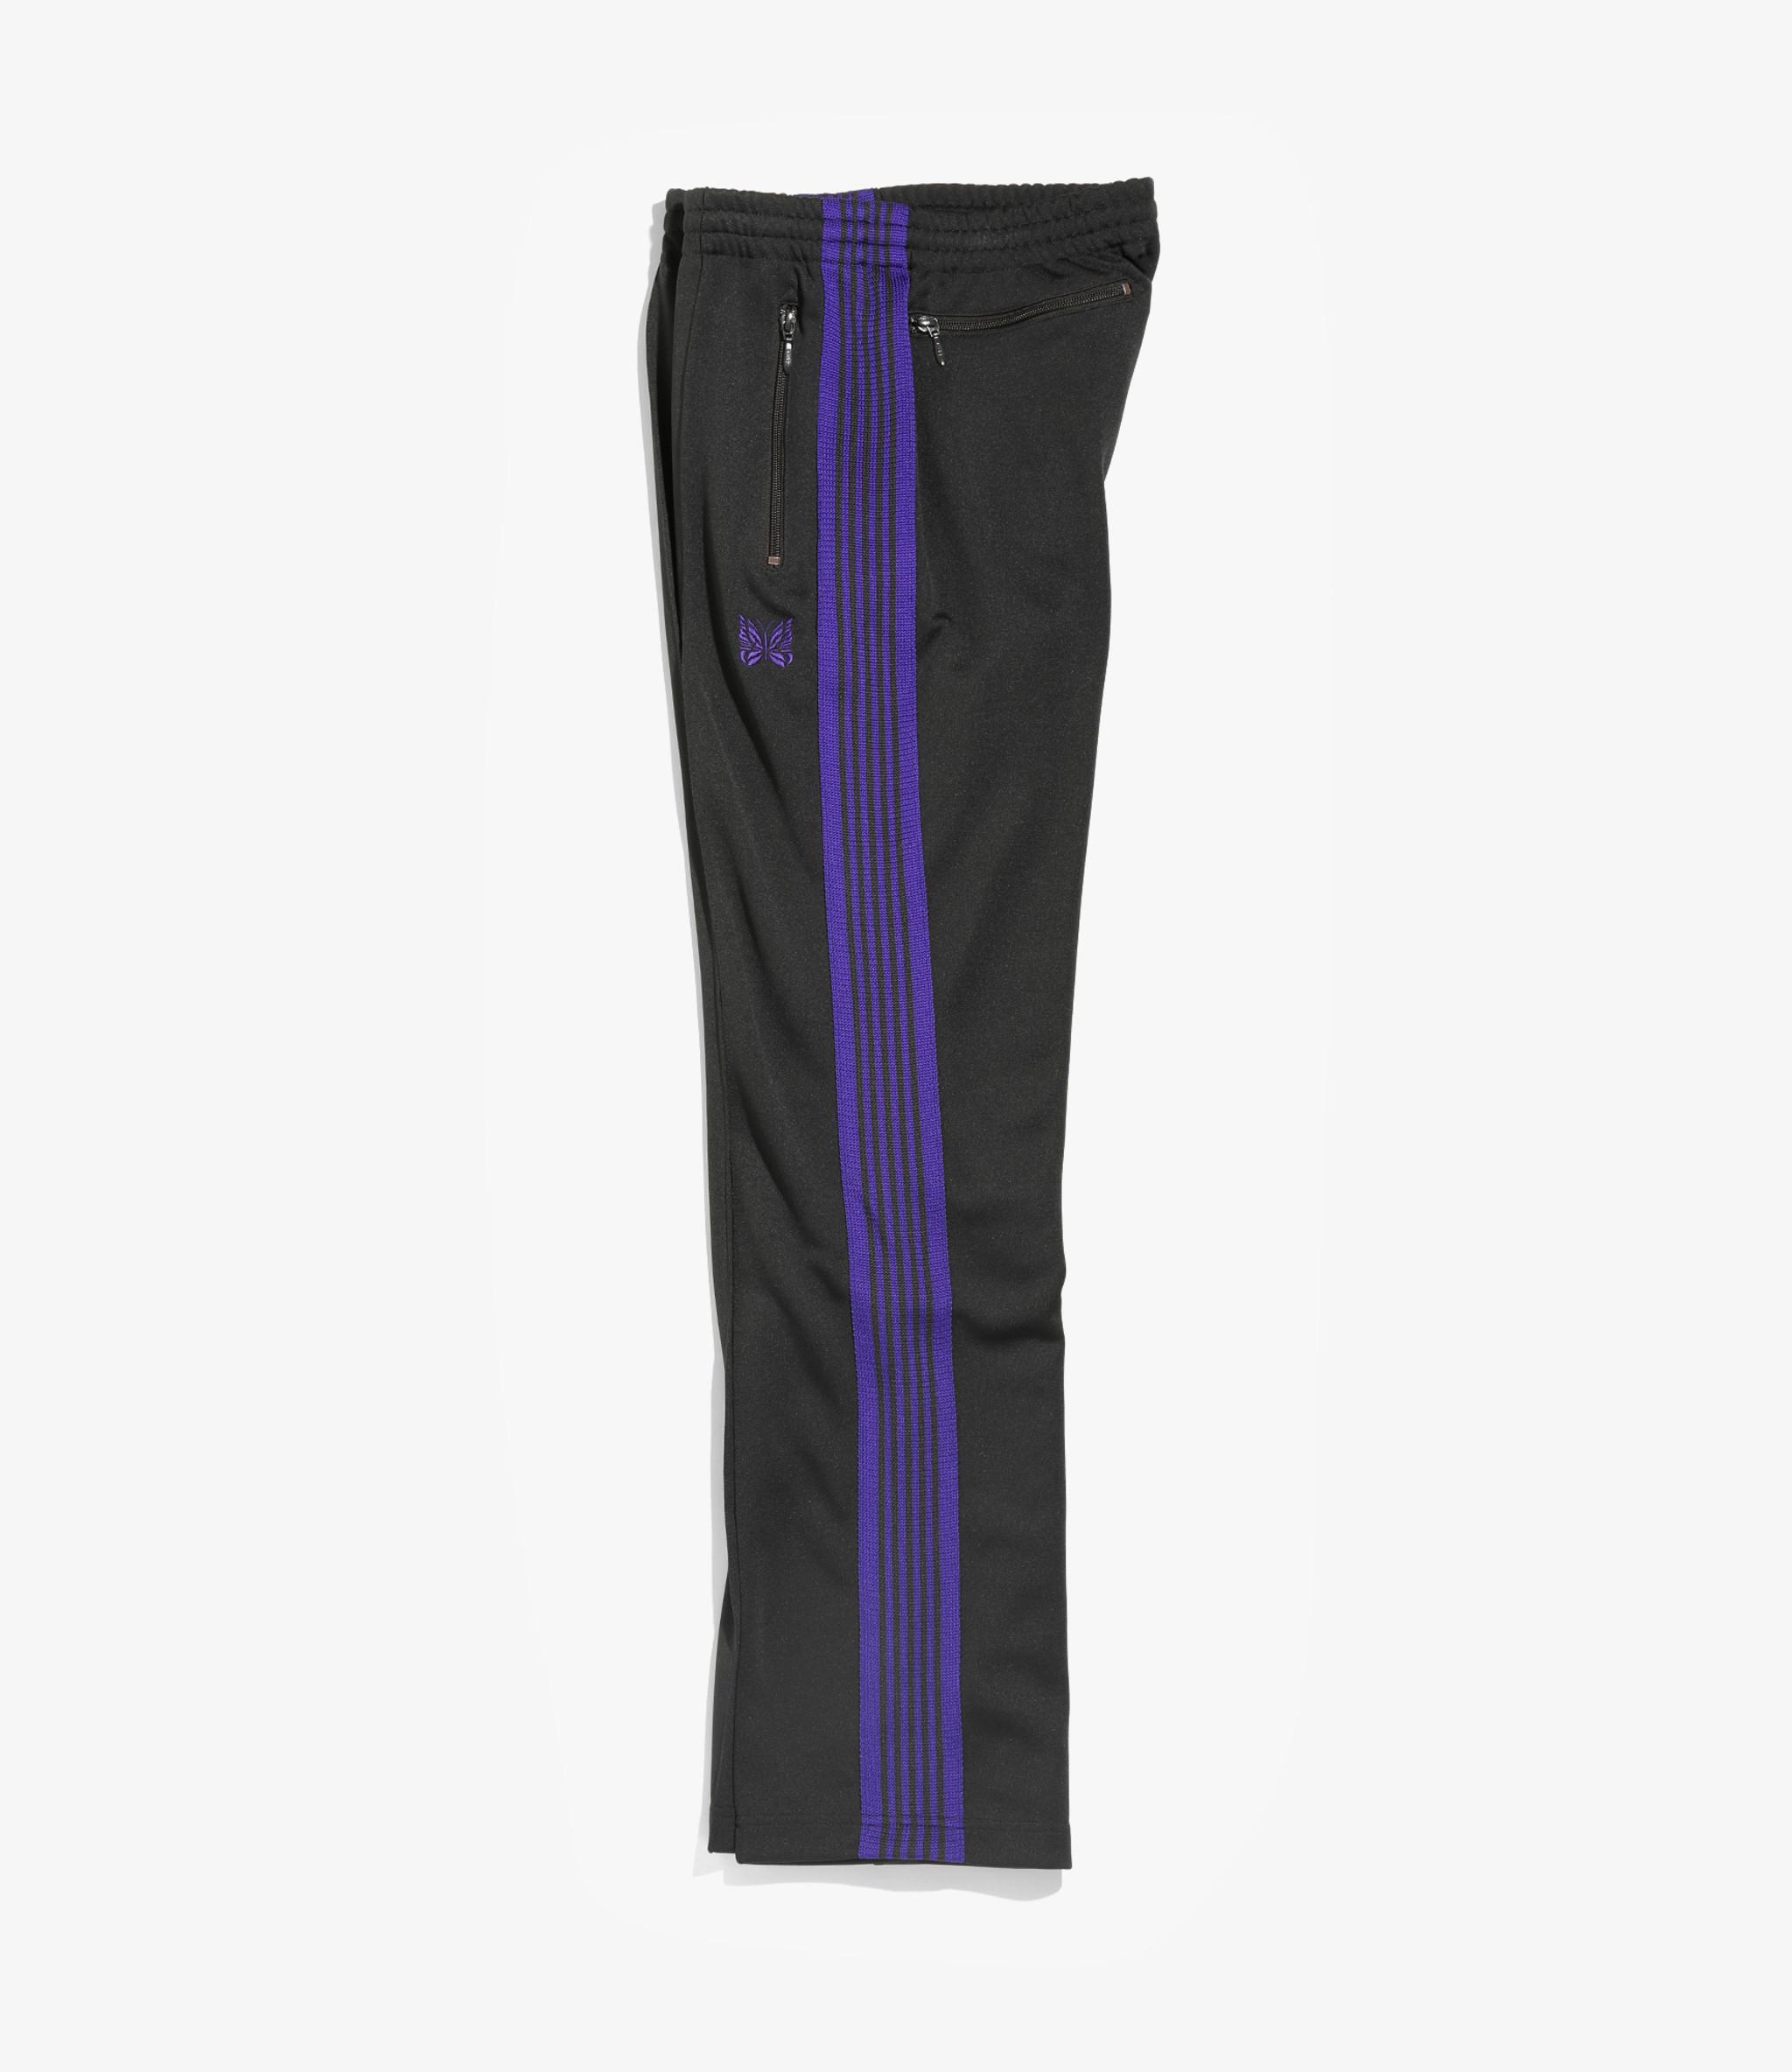 Needles Narrow Track Pant - Poly Smooth - Charcoal